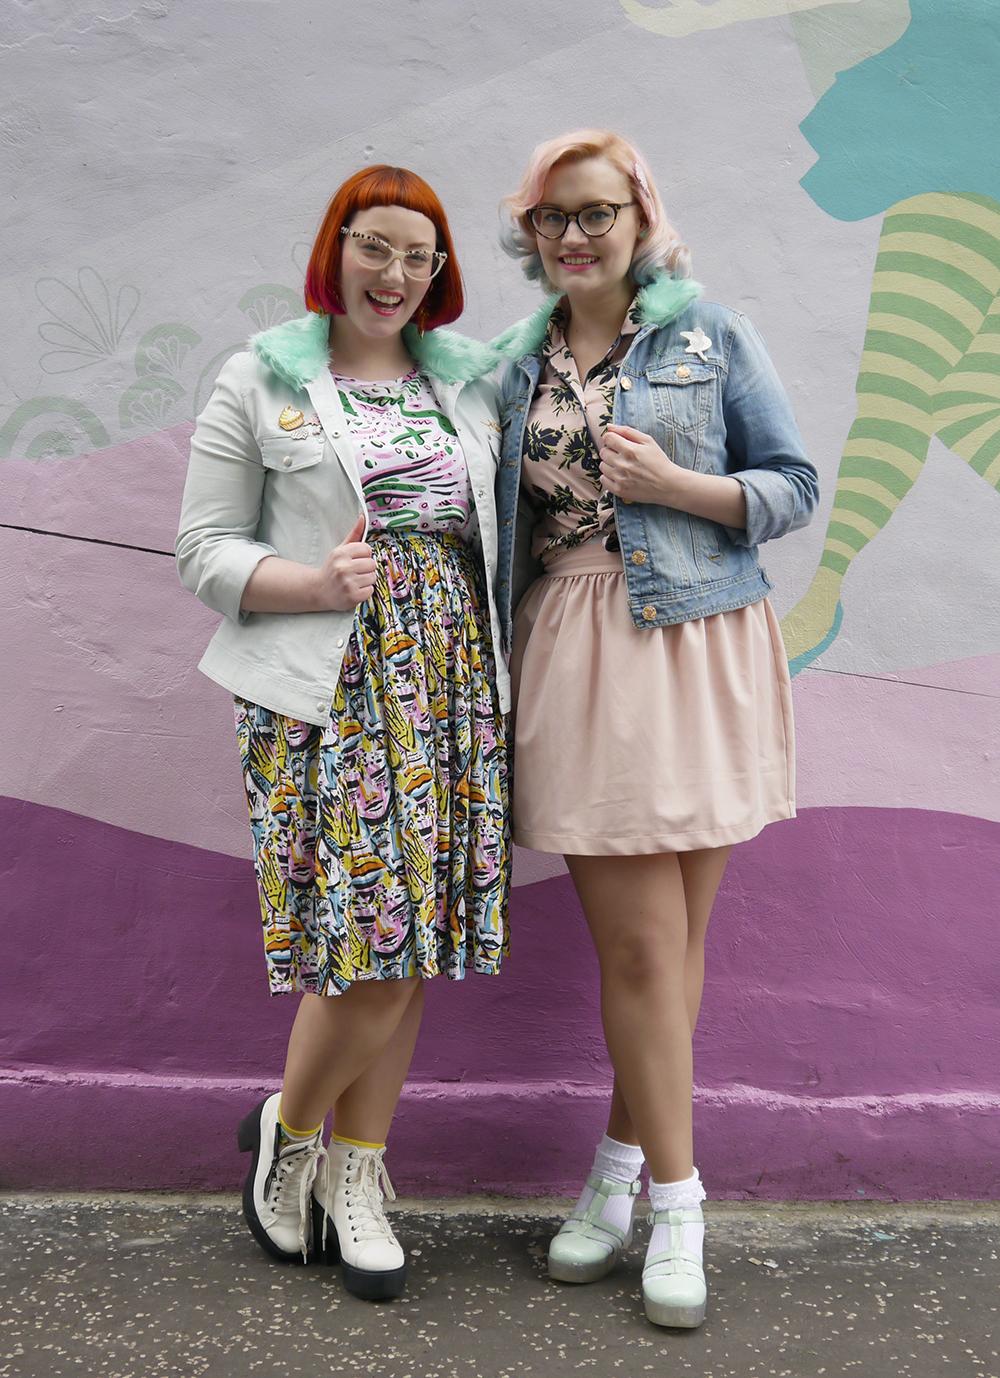 blog birthday, blogging duo, Edinburgh bloggers, Scottish bloggers, blogger style, Edinburgh street style, colourful style, clashing prints, pink hair, dip dye, red hair, ginger, girls who wear glasses, Monki style, customised denim jackets, milkshakes, Rollershakes, Hawaiian shirts, faux fur, ice cream cone graffiti, Edinburgh street art, colourful wall art